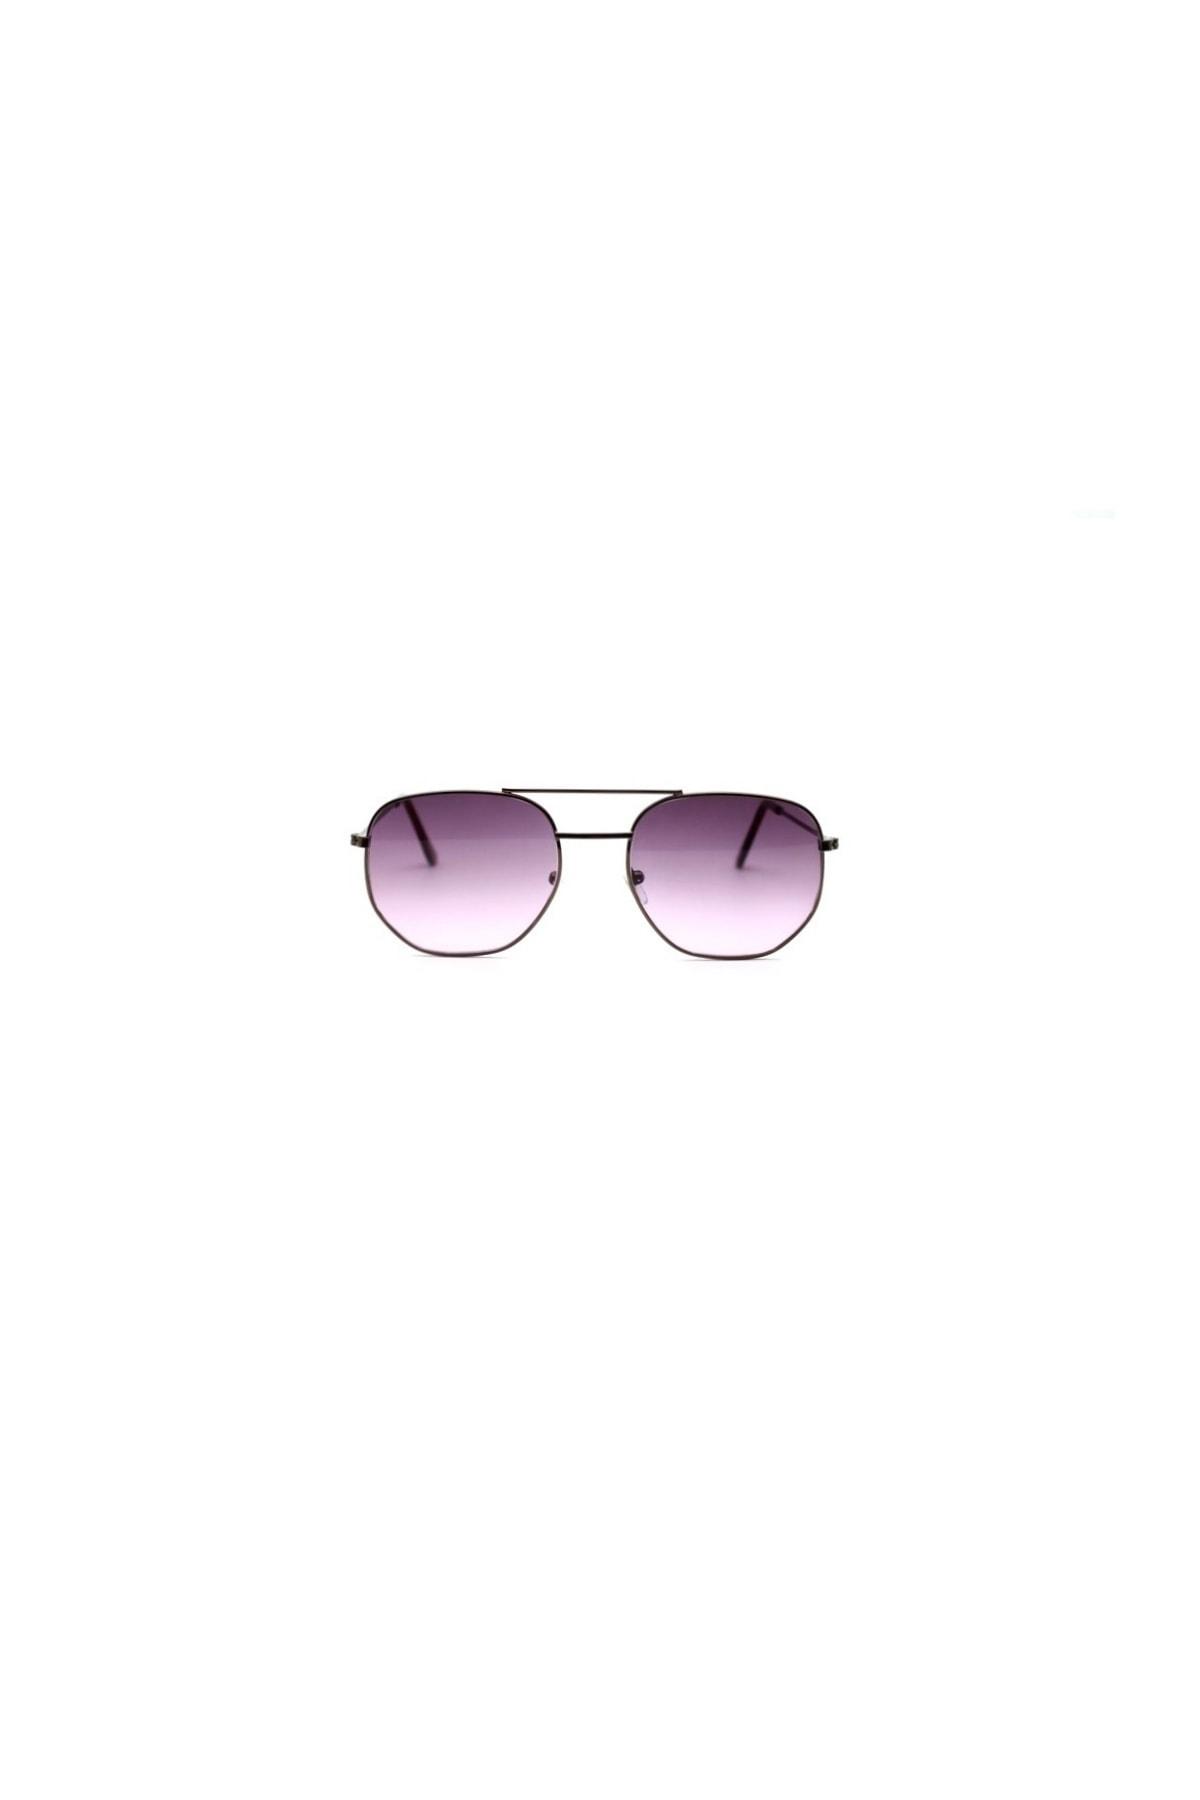 CUTE CAT Hidra Purple Degrade Small Hexagon Unisex Güneş Gözlüğü 2